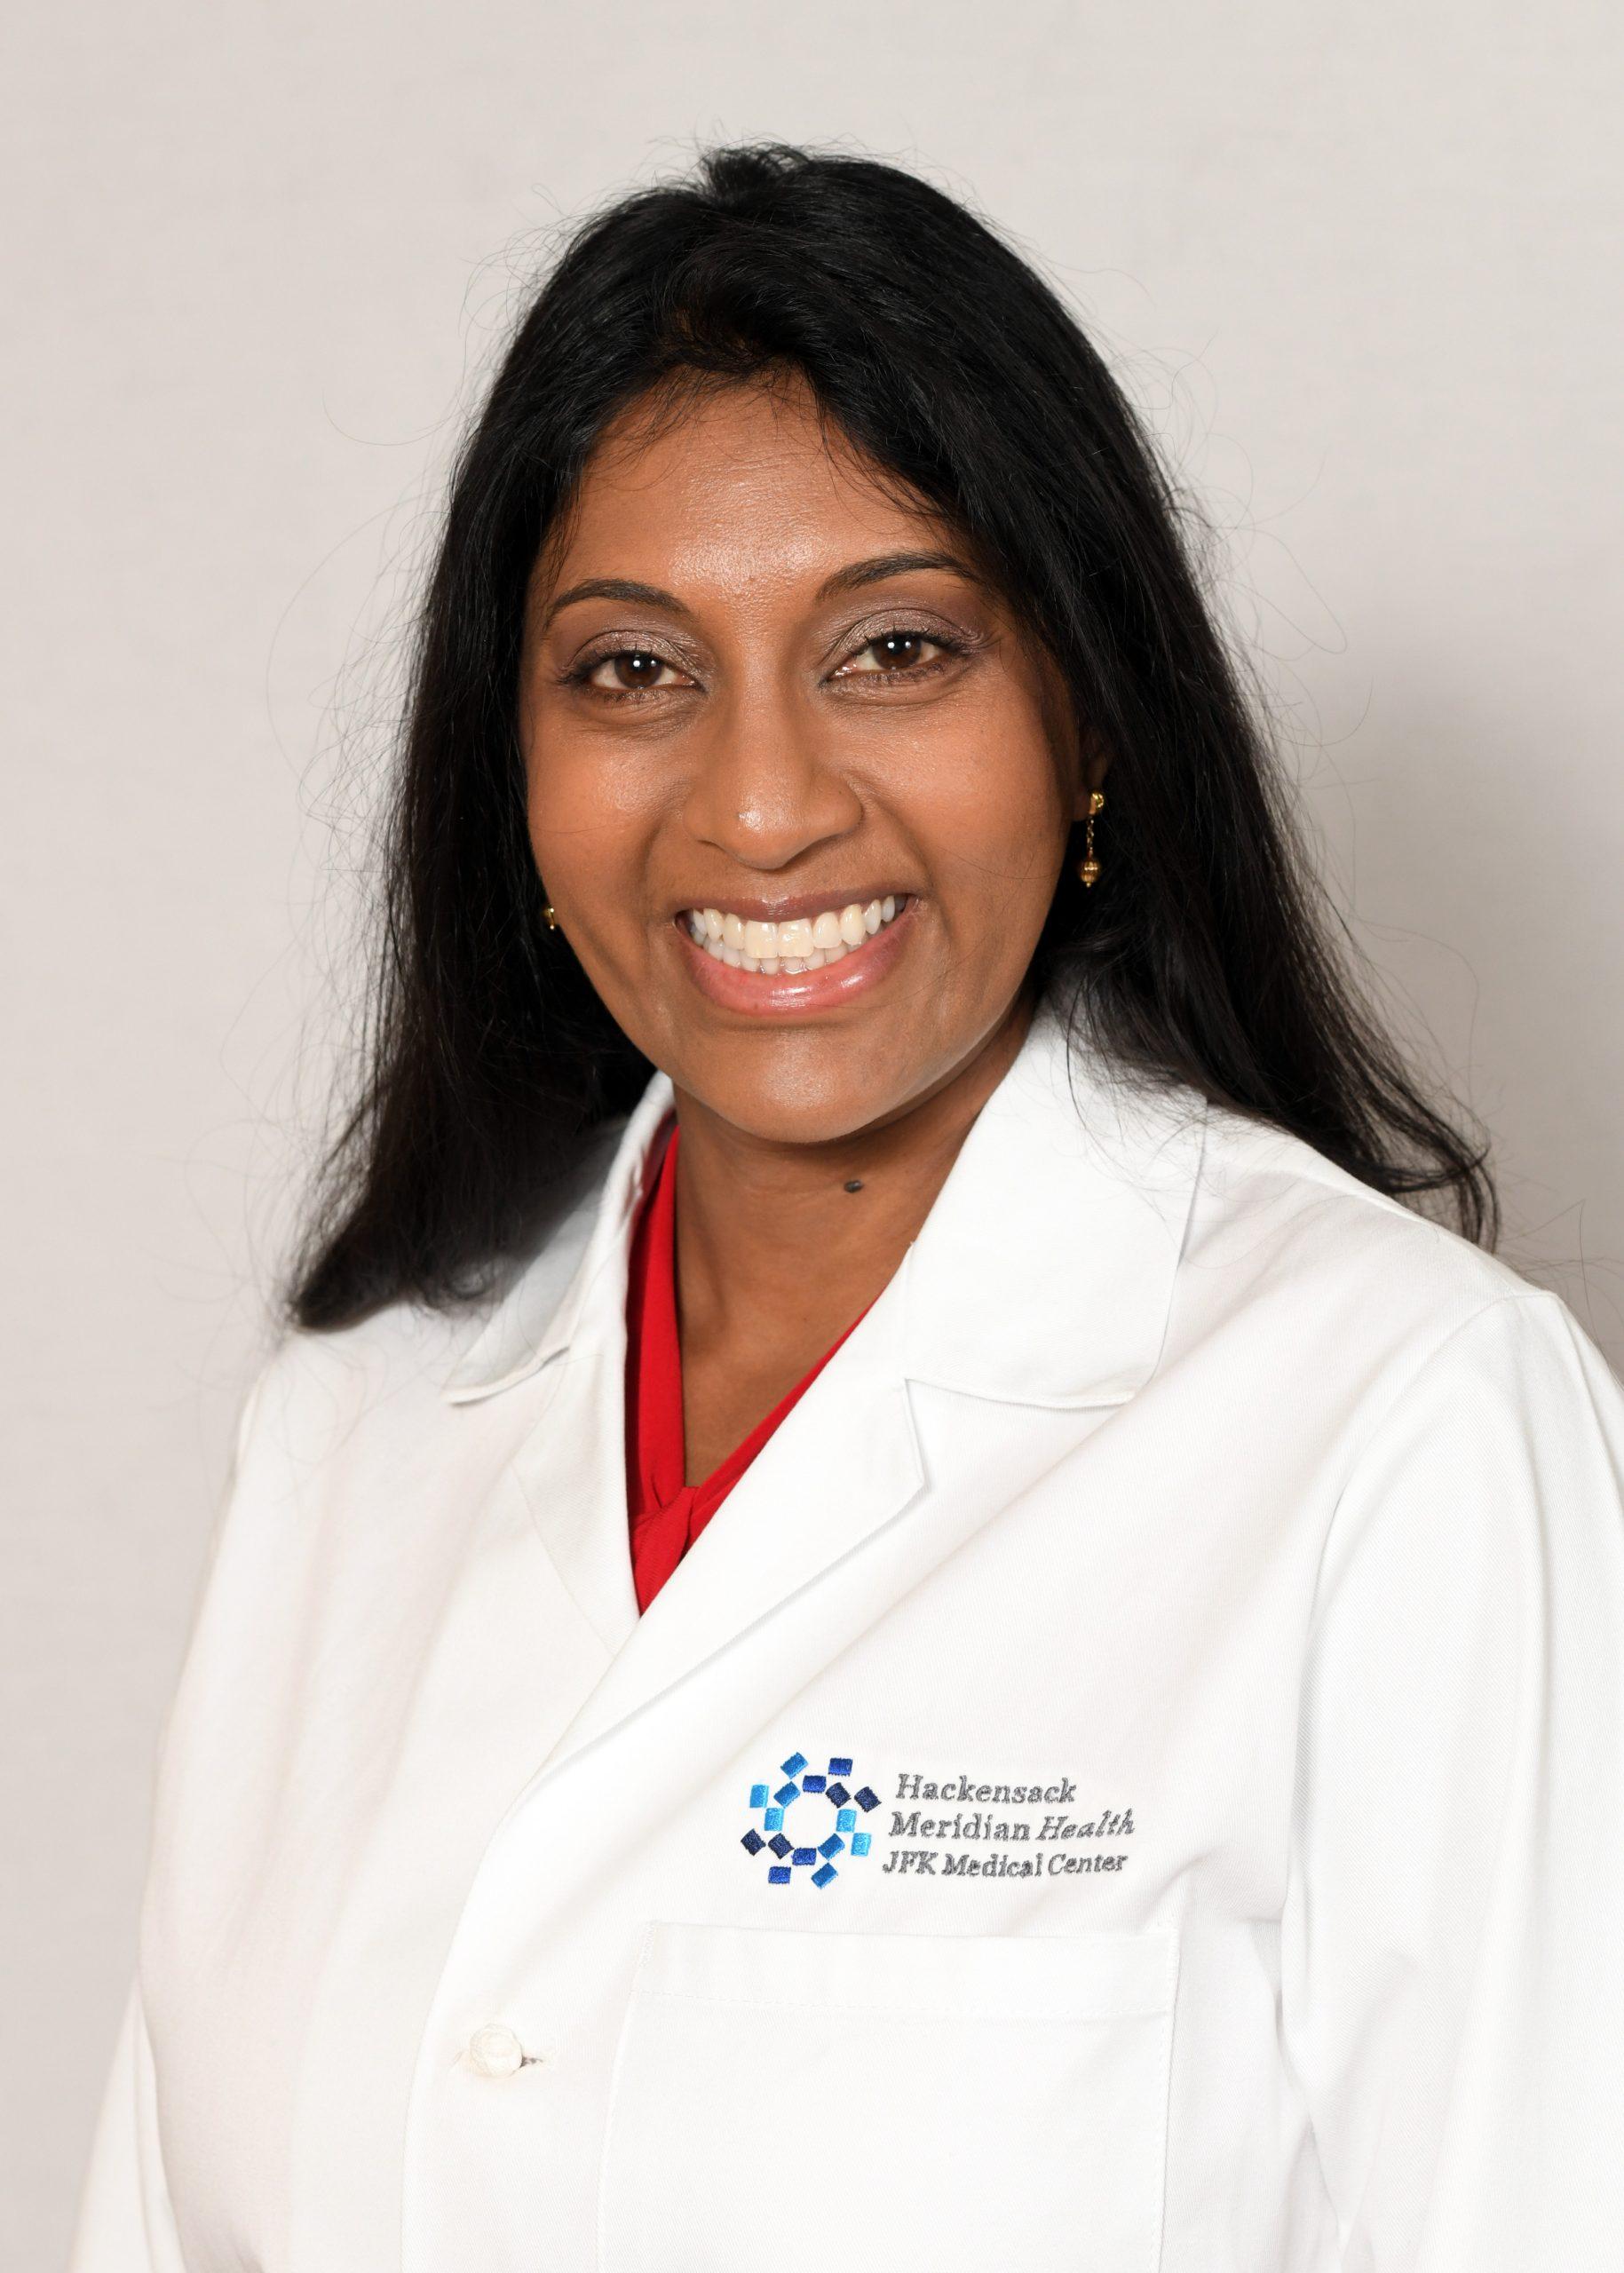 Image of Asha Iyer, M.D., Ph.D.